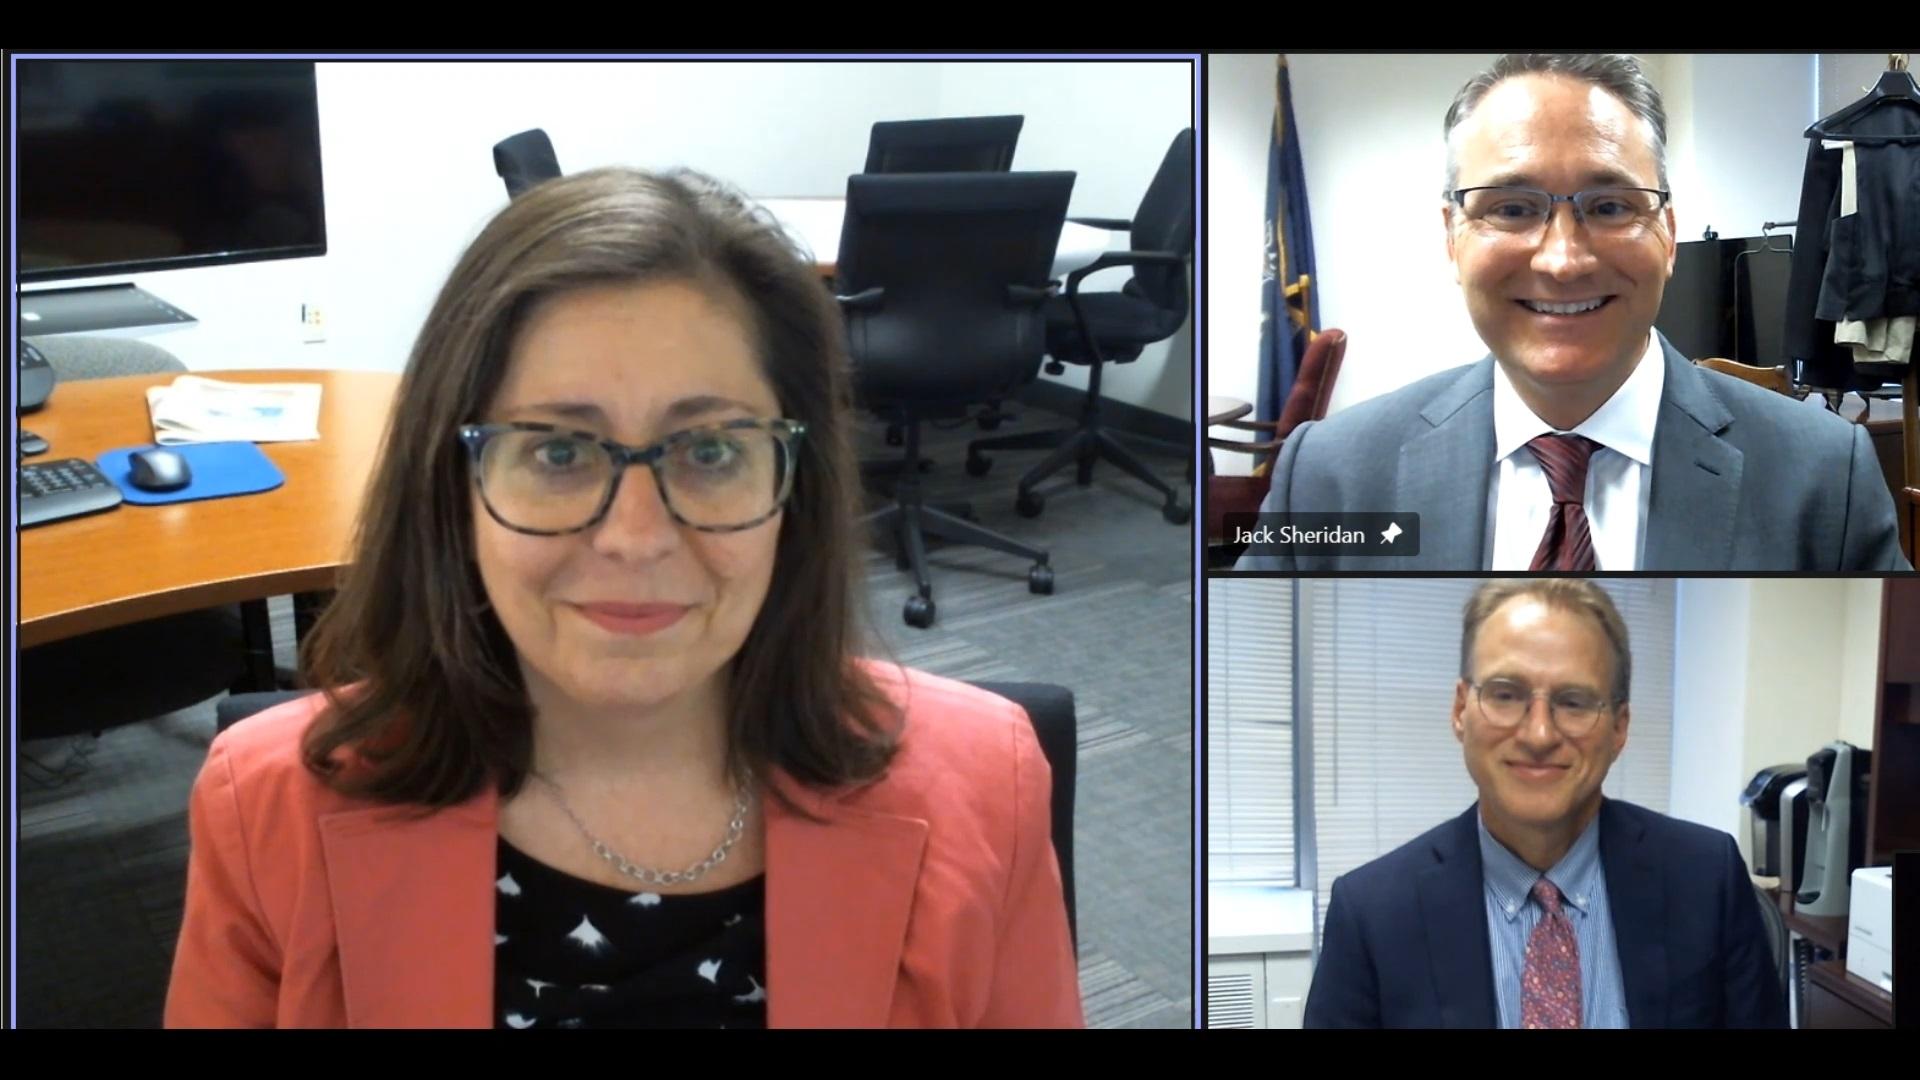 Christine Sisario, Justin Barry, and Jack Sheridan